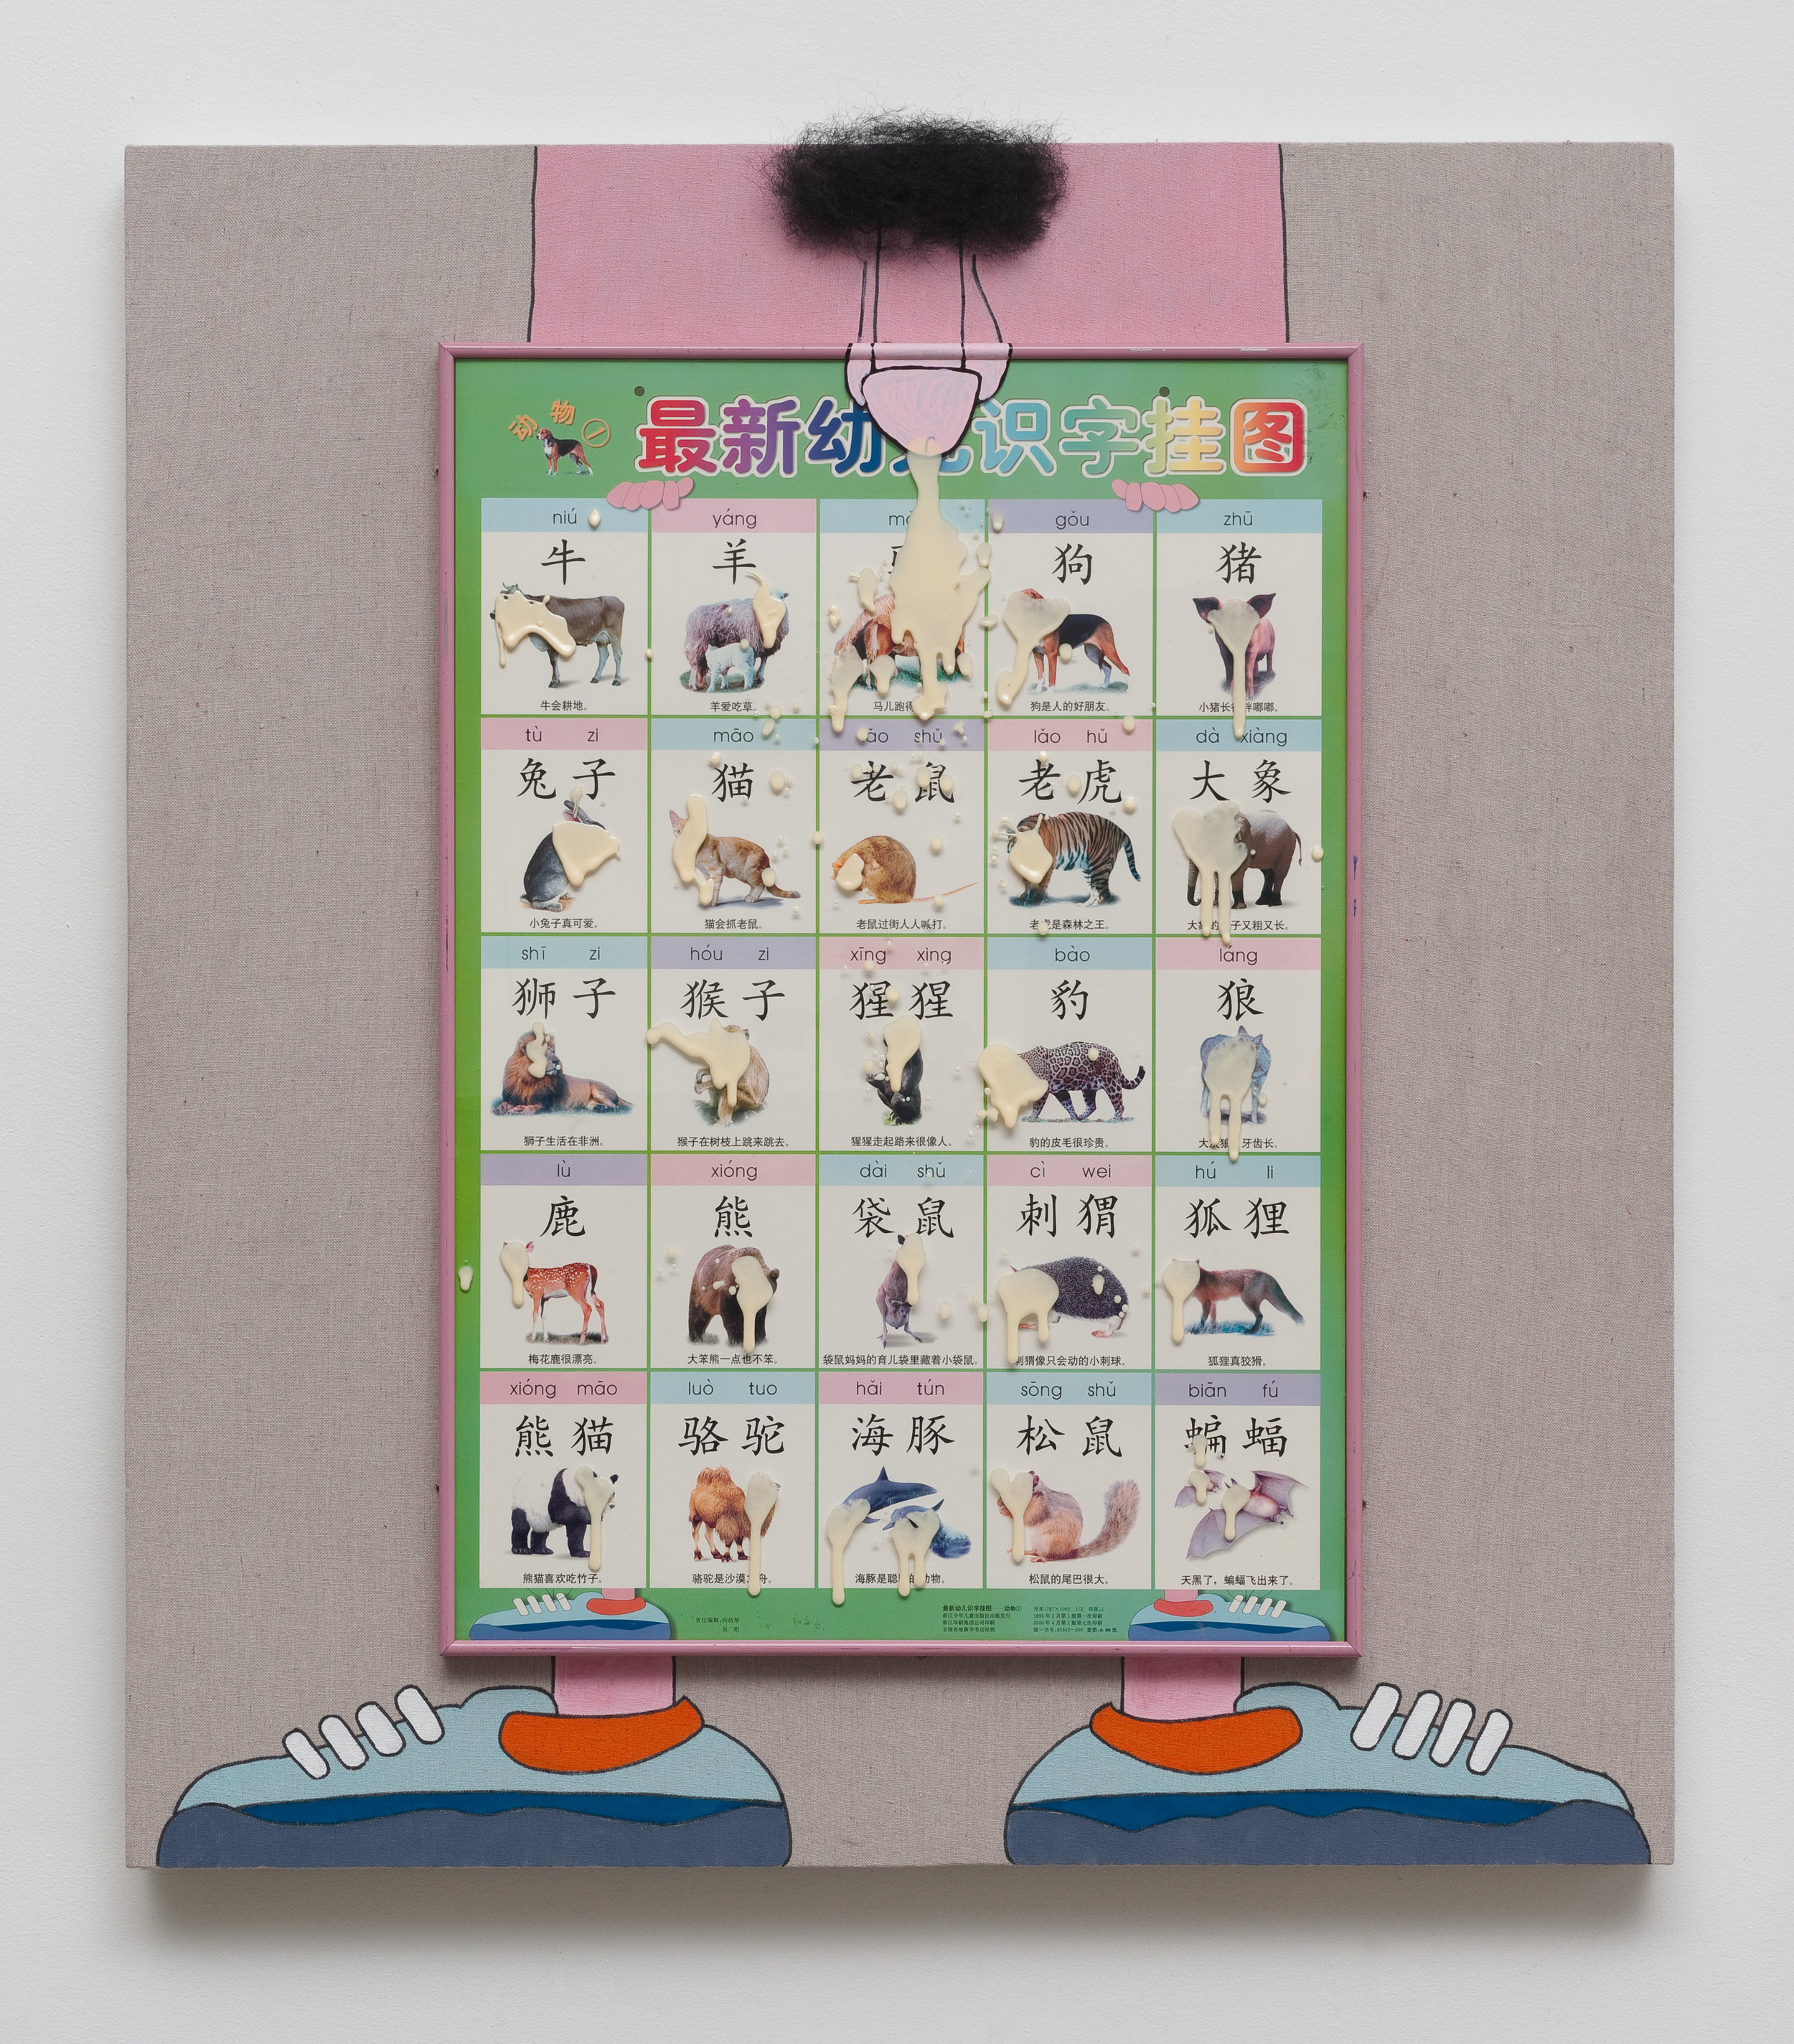 Wild Kingdom, 2013 canvas, framed image, acrylic, urethane, marker, wig hair, wire, wood 101,6 x 91,5 cm - 40 x 36 inches